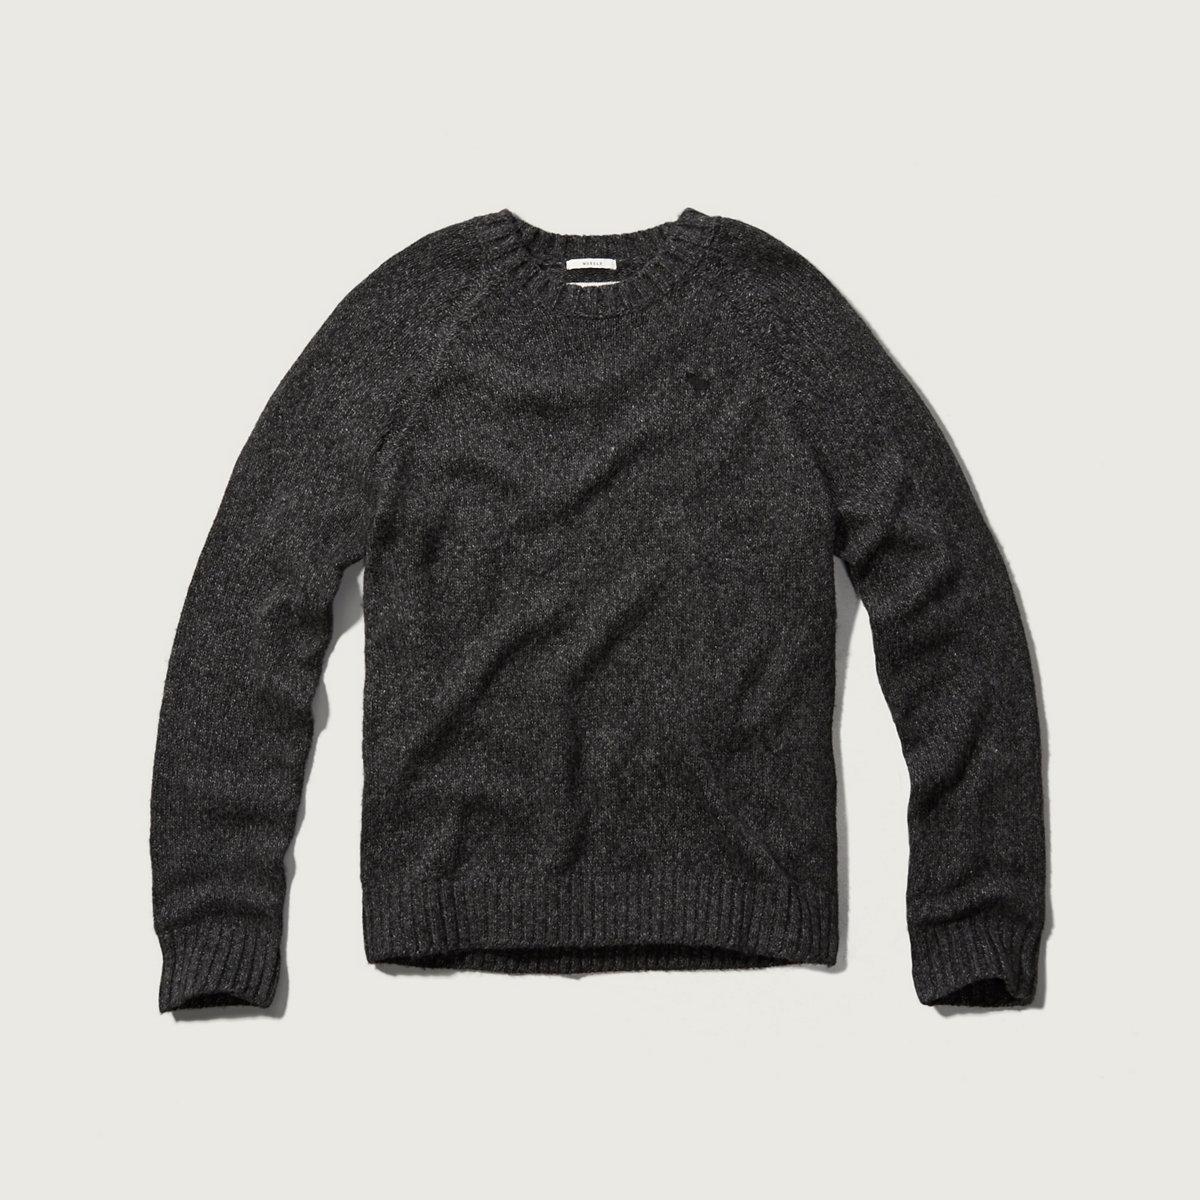 Blake Peak Crew Sweater